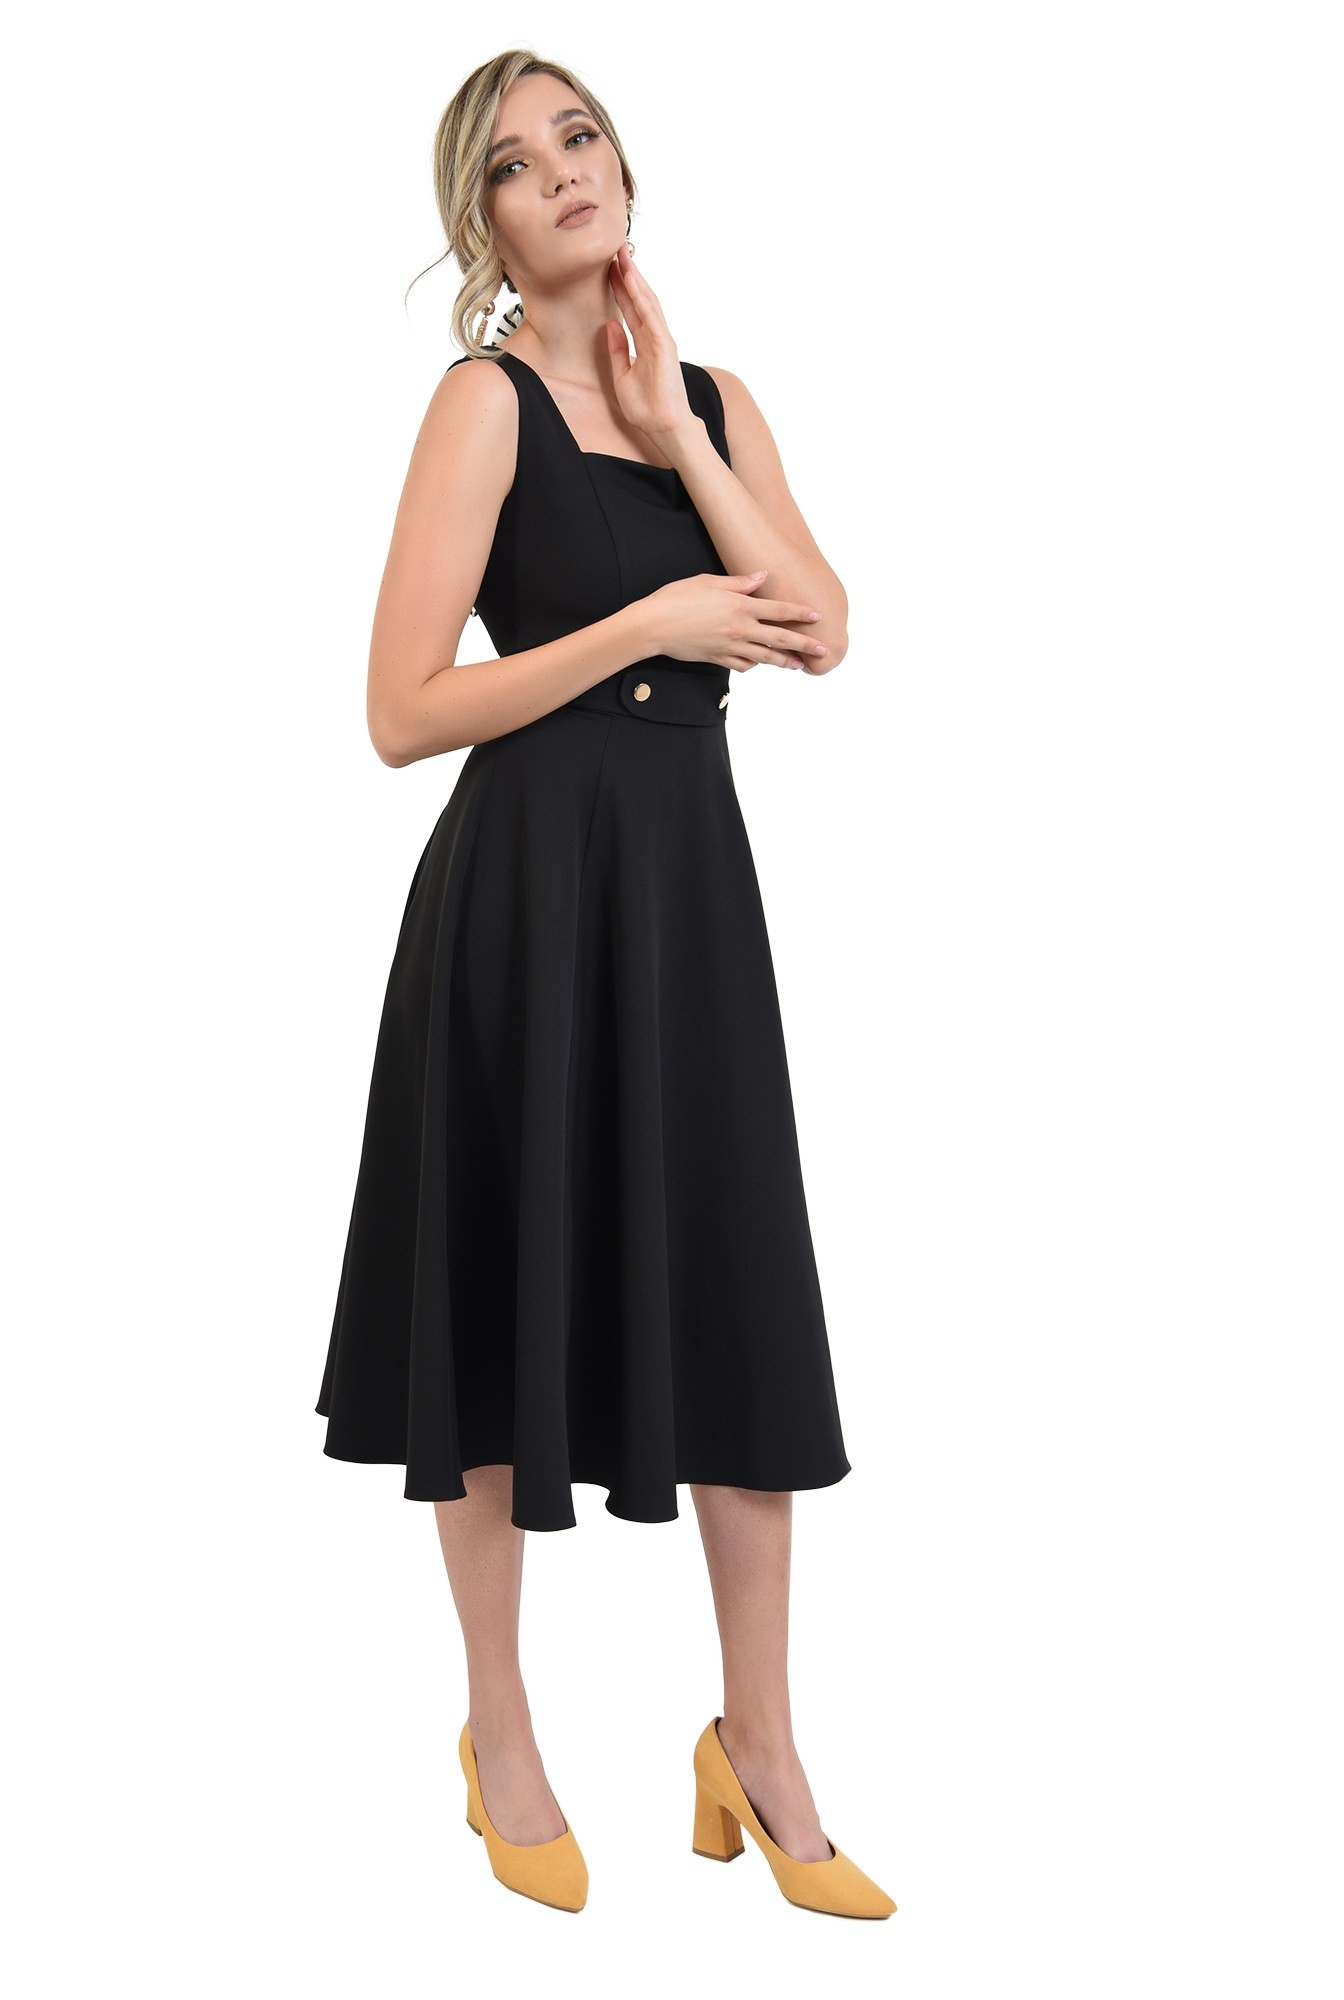 360 - rochie neagra, cu detaliu la talie, evazata, Poema